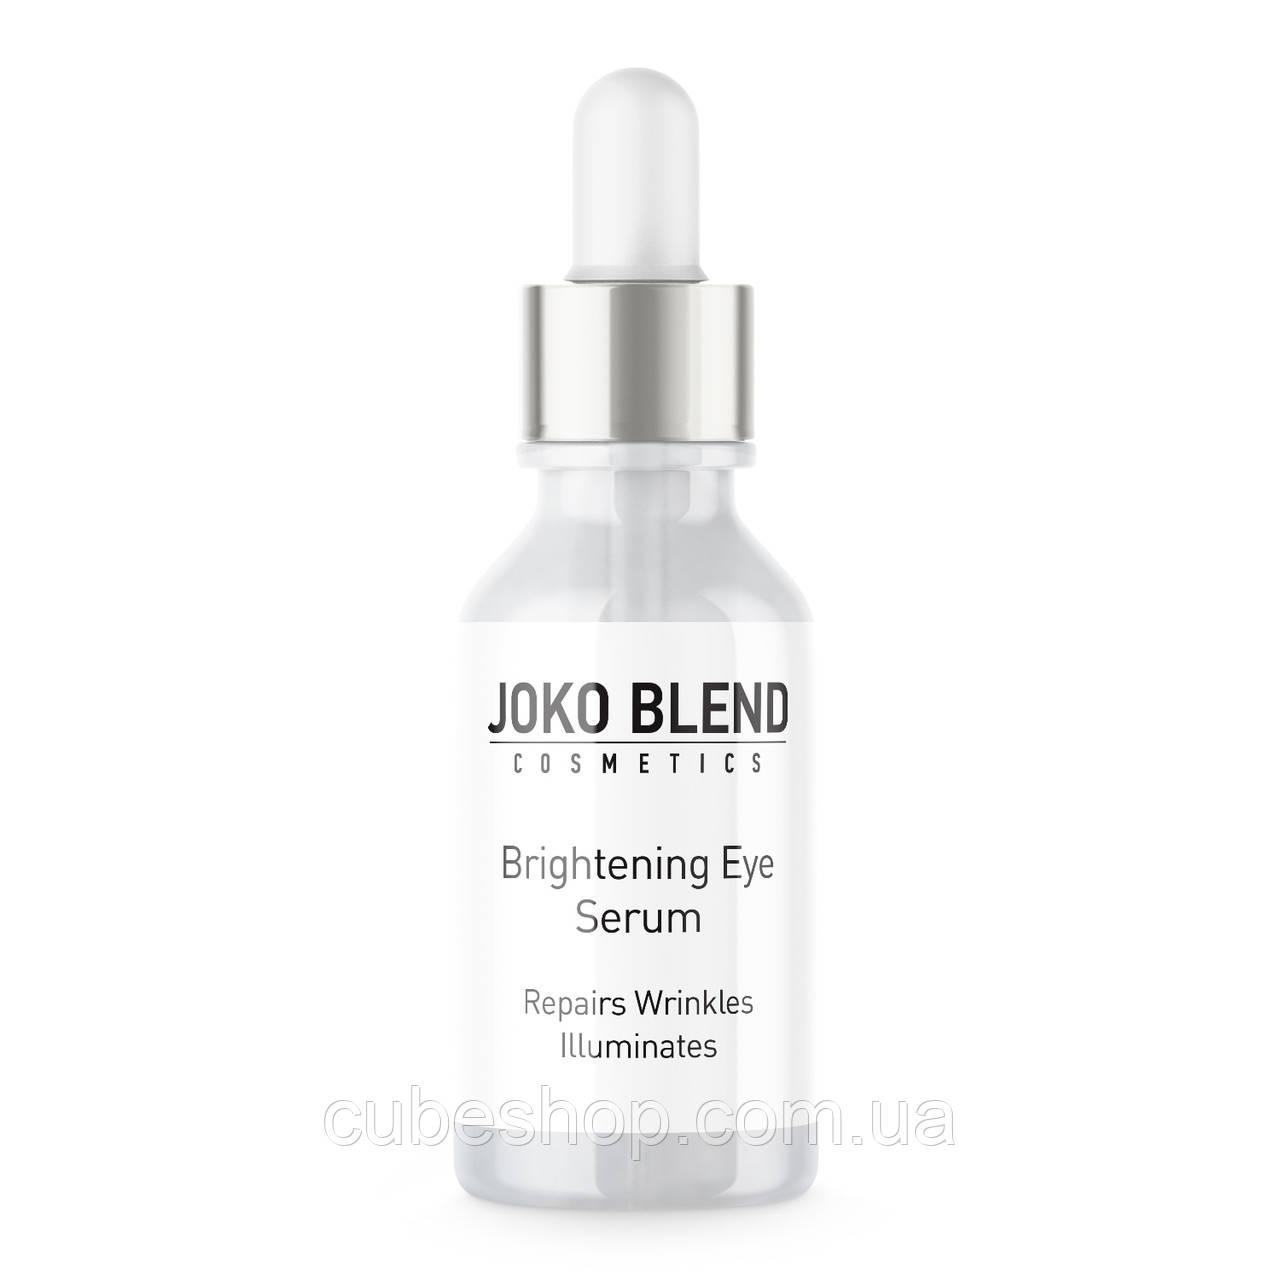 Сыворотка для кожи вокруг глаз Brightening Eye Serum, 10 мл